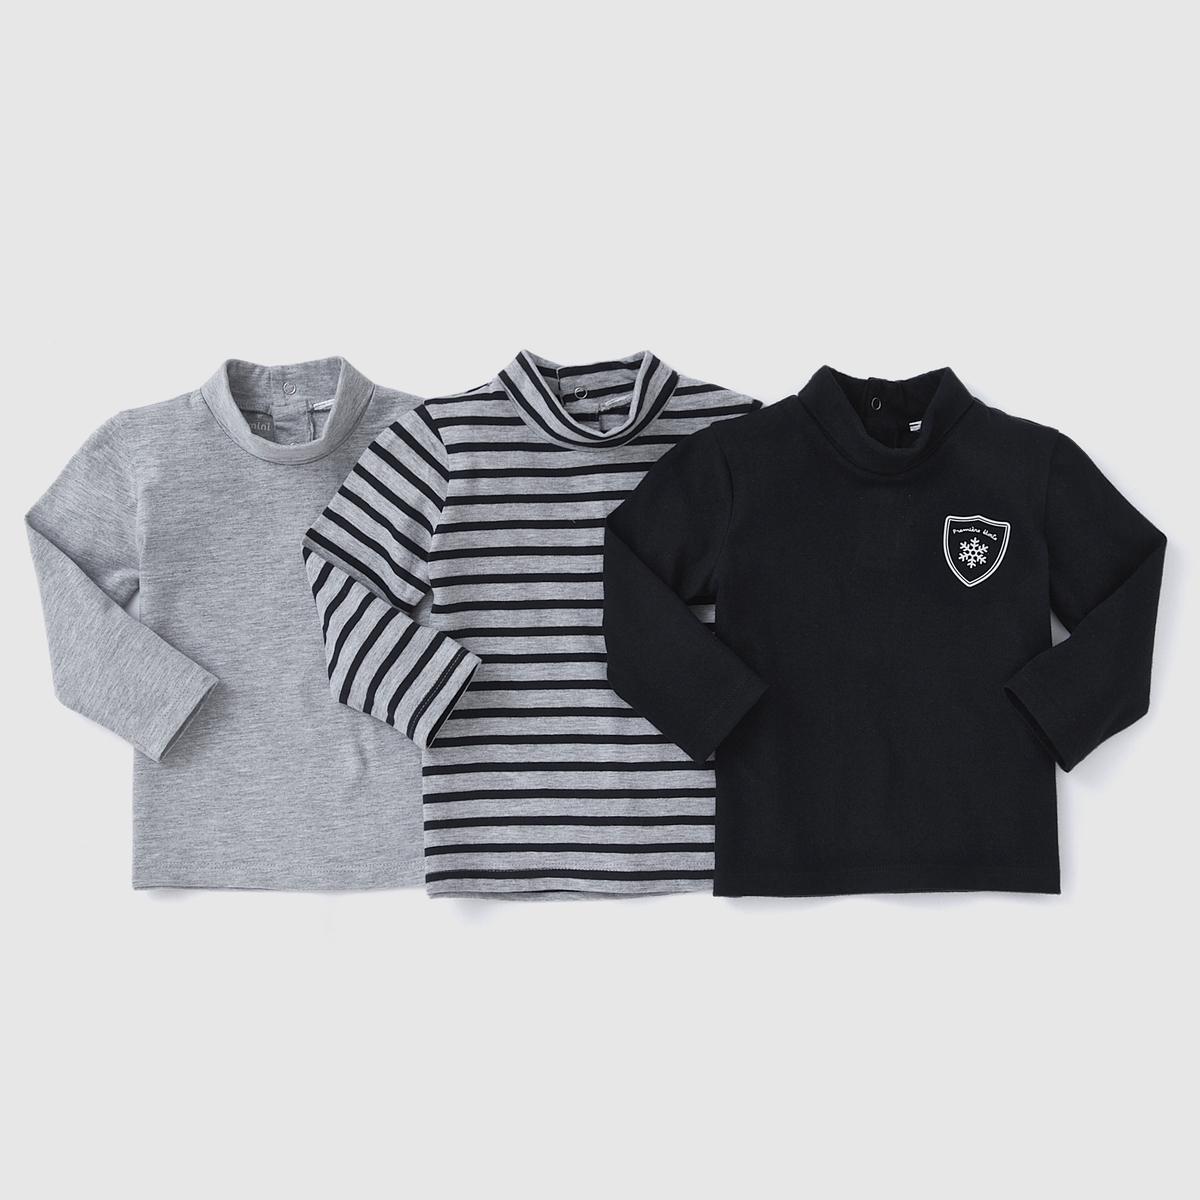 3 футболки с закатывающимся воротником 1 мес-3 лет от La Redoute